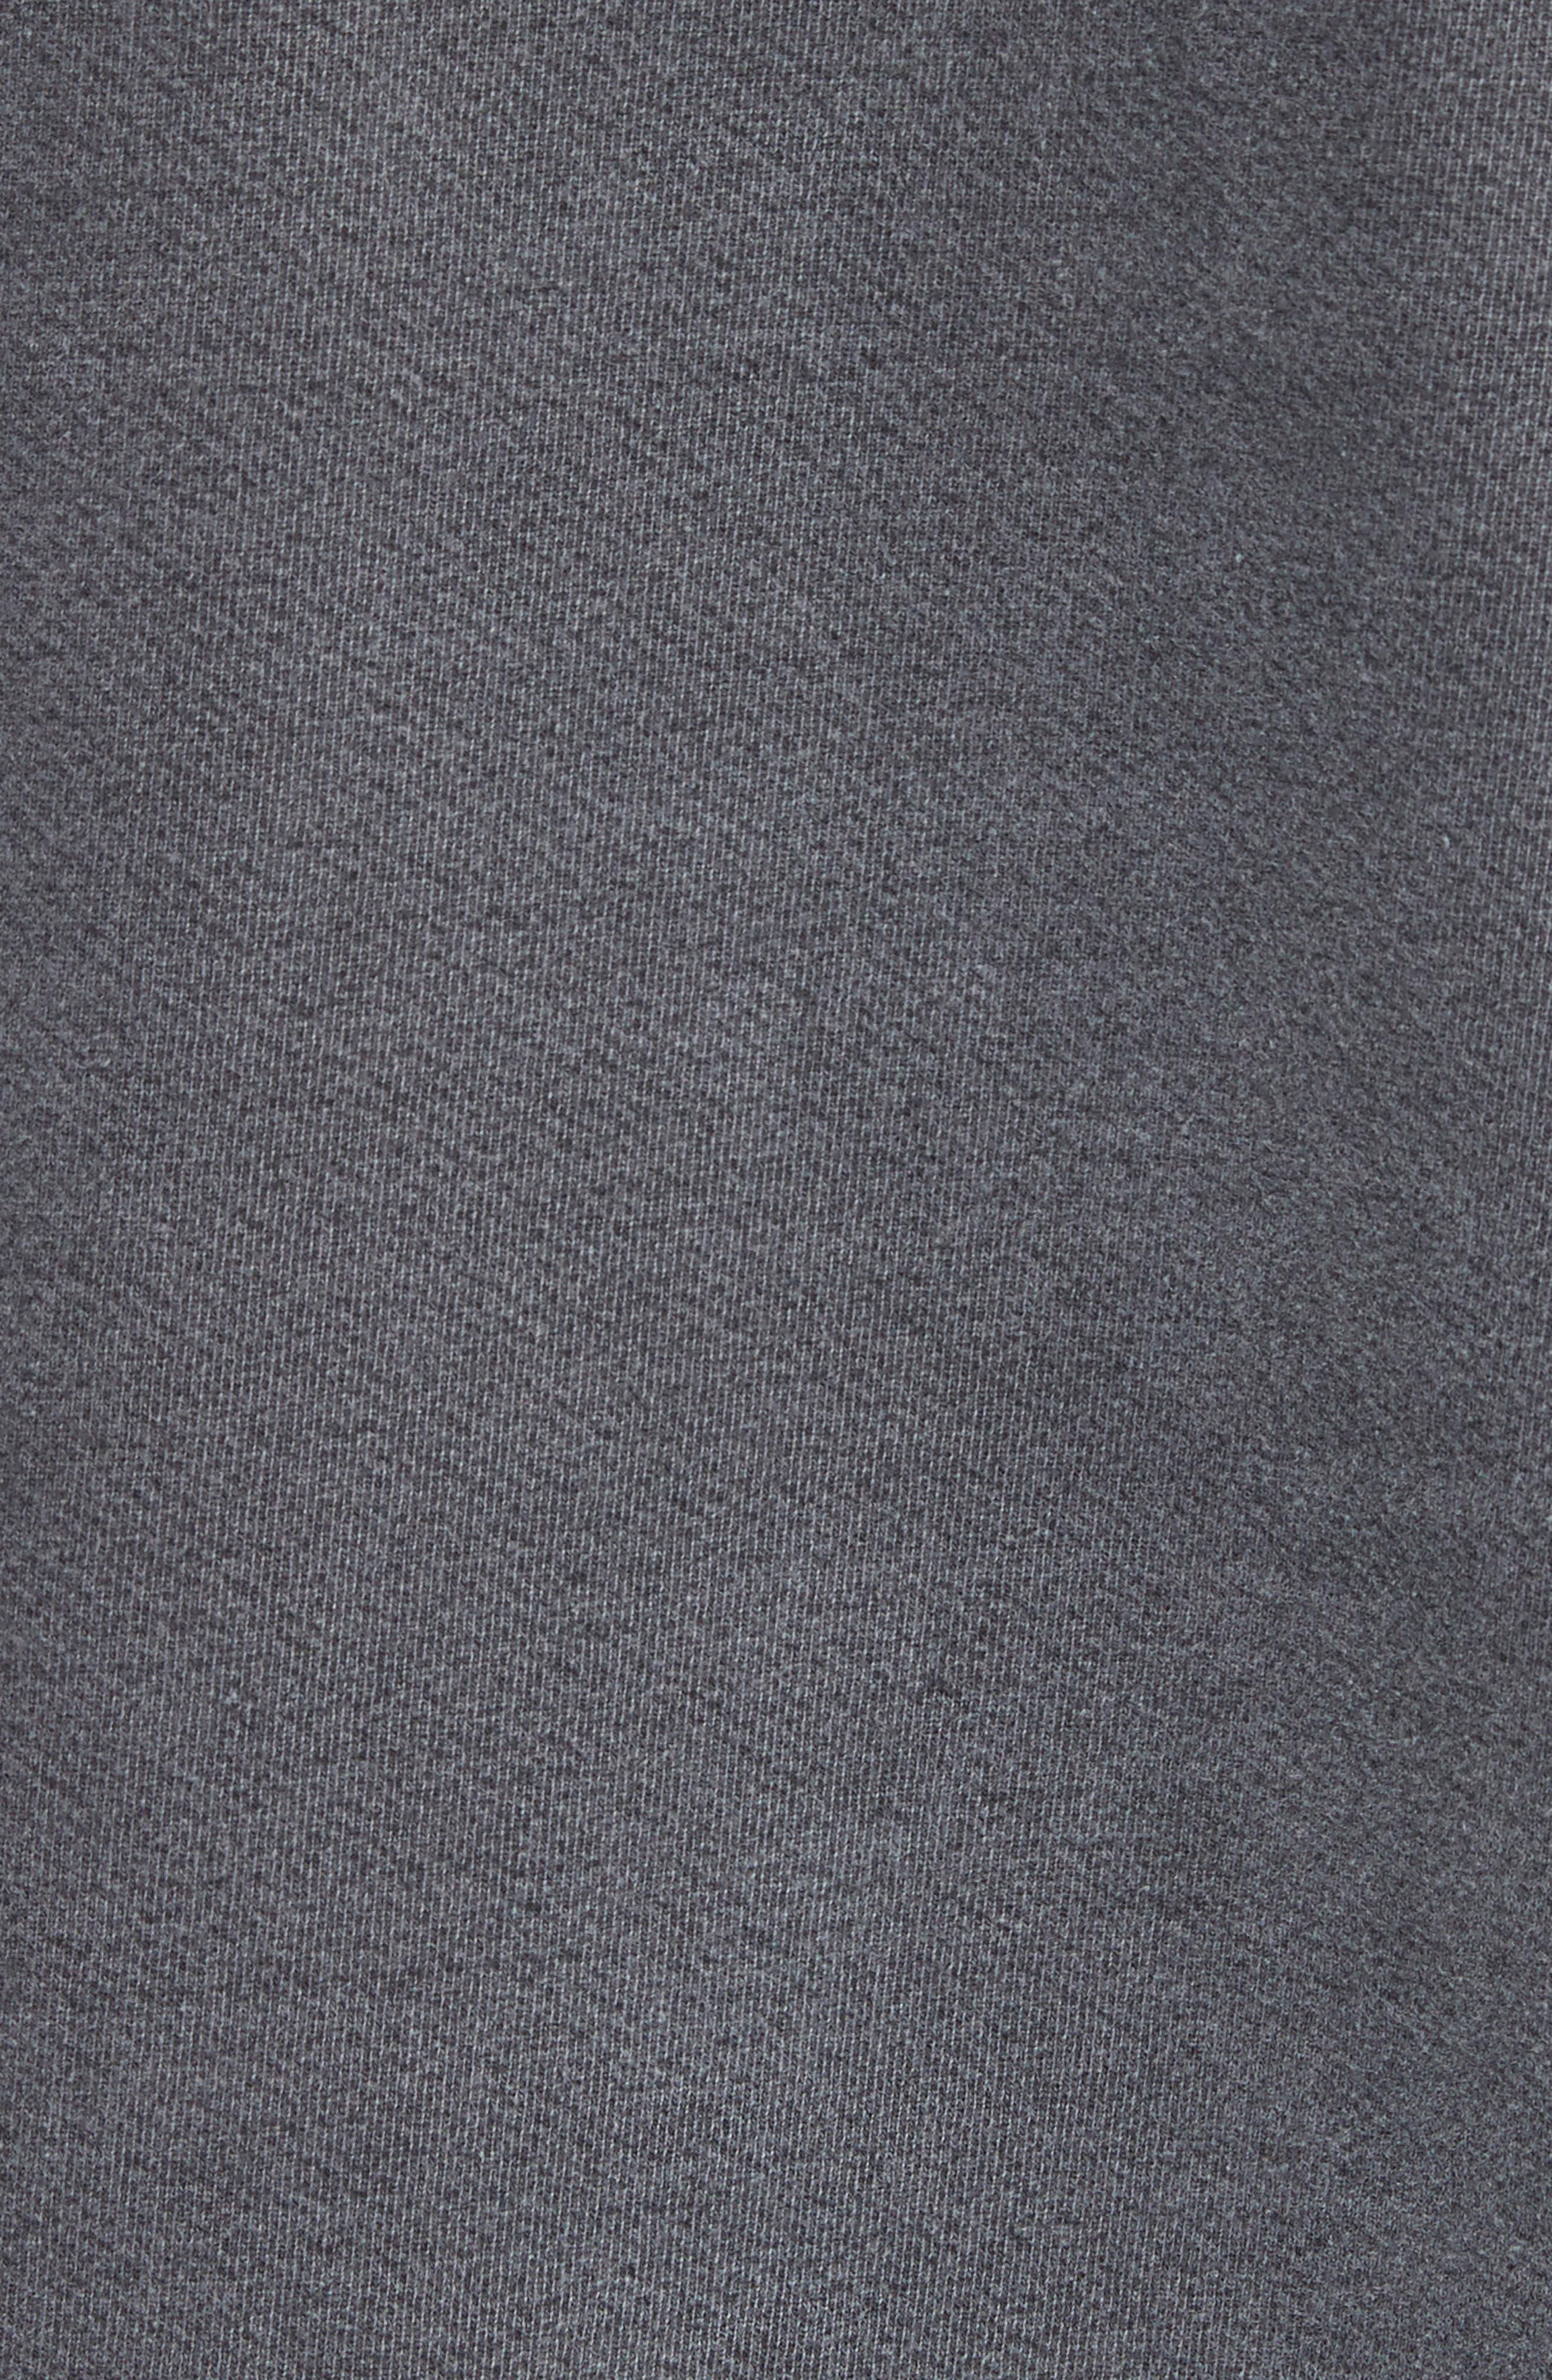 Norton Sweatshirt,                             Alternate thumbnail 5, color,                             001